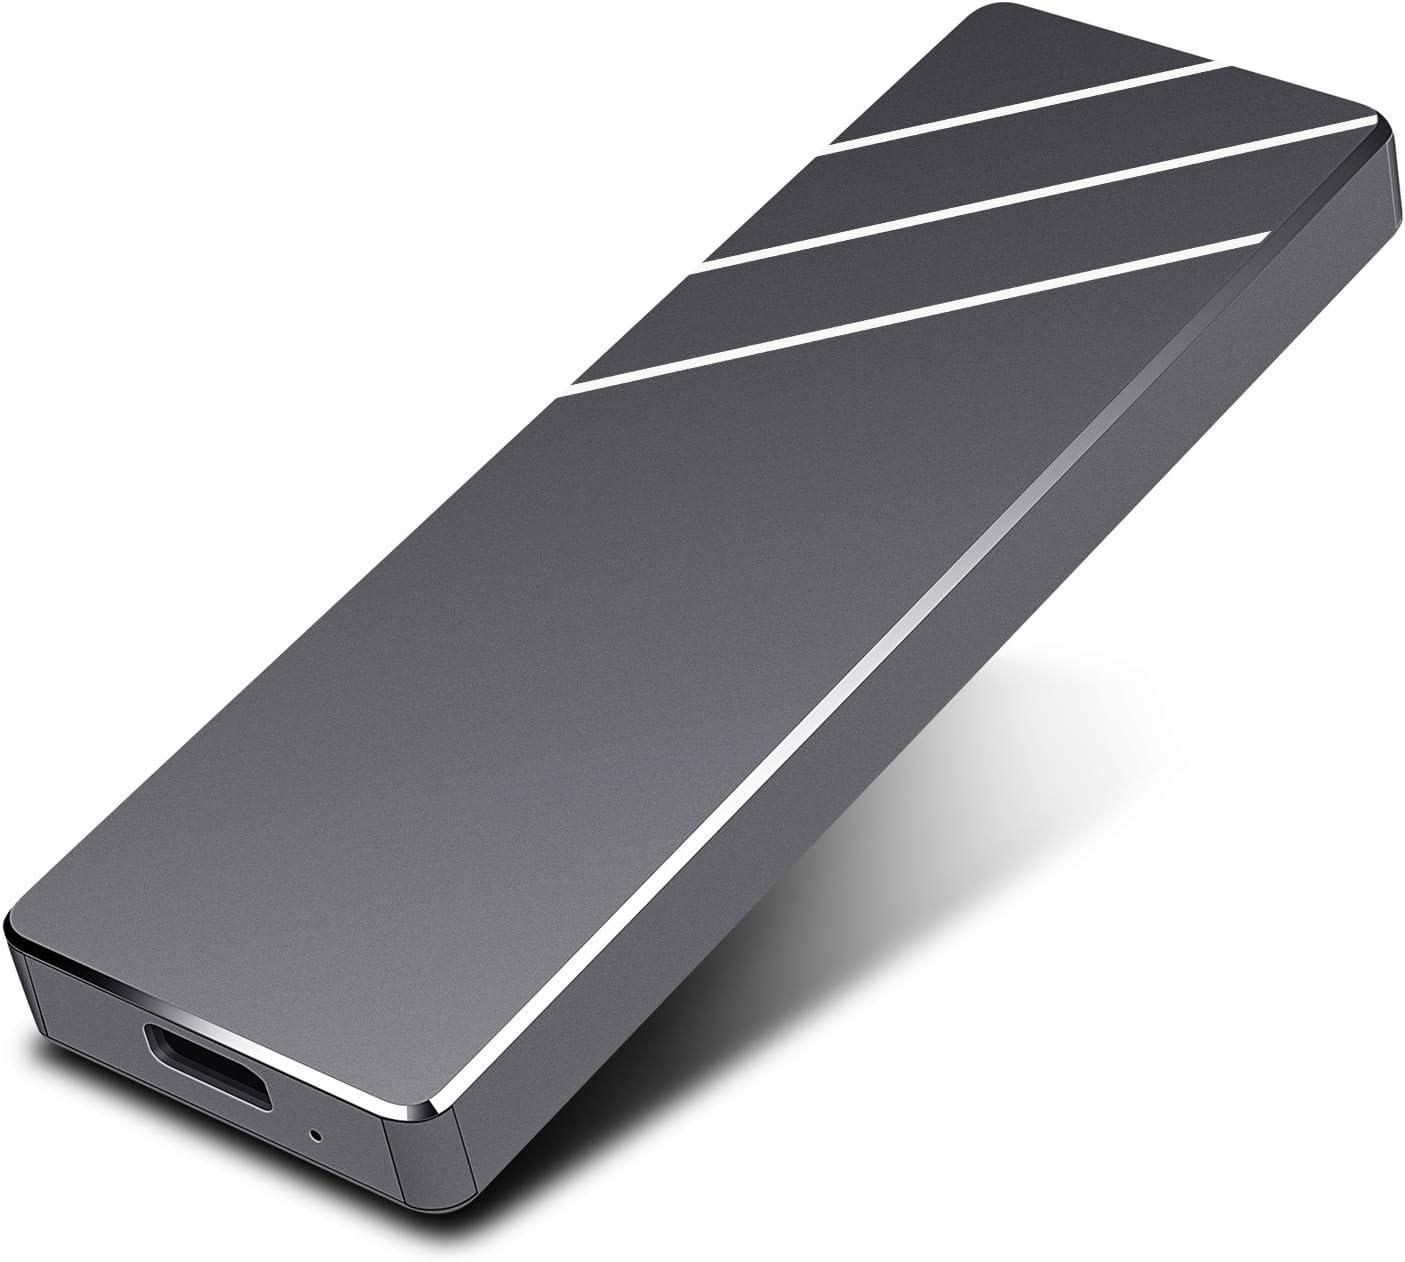 External Hard Drive Portable USB 3.1 Slim External Hard Drive 1TB Compatible with PC, Mac, MacBook, Desktop, Laptop, Chromebook, Xbox One, Xbox 360 (Black, 1TB)